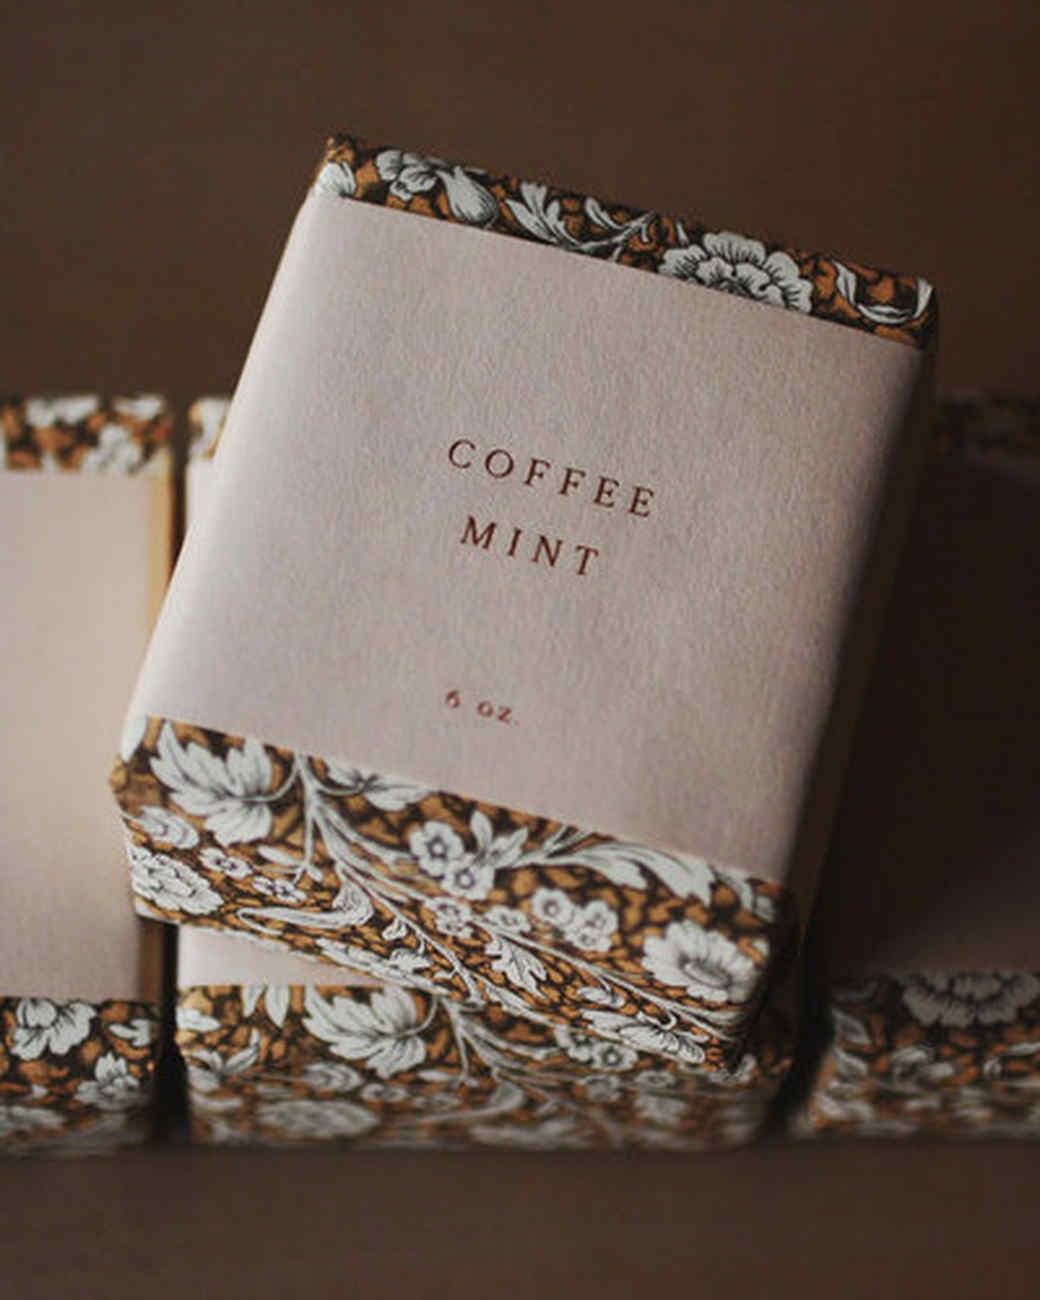 Saipua coffee mint soap